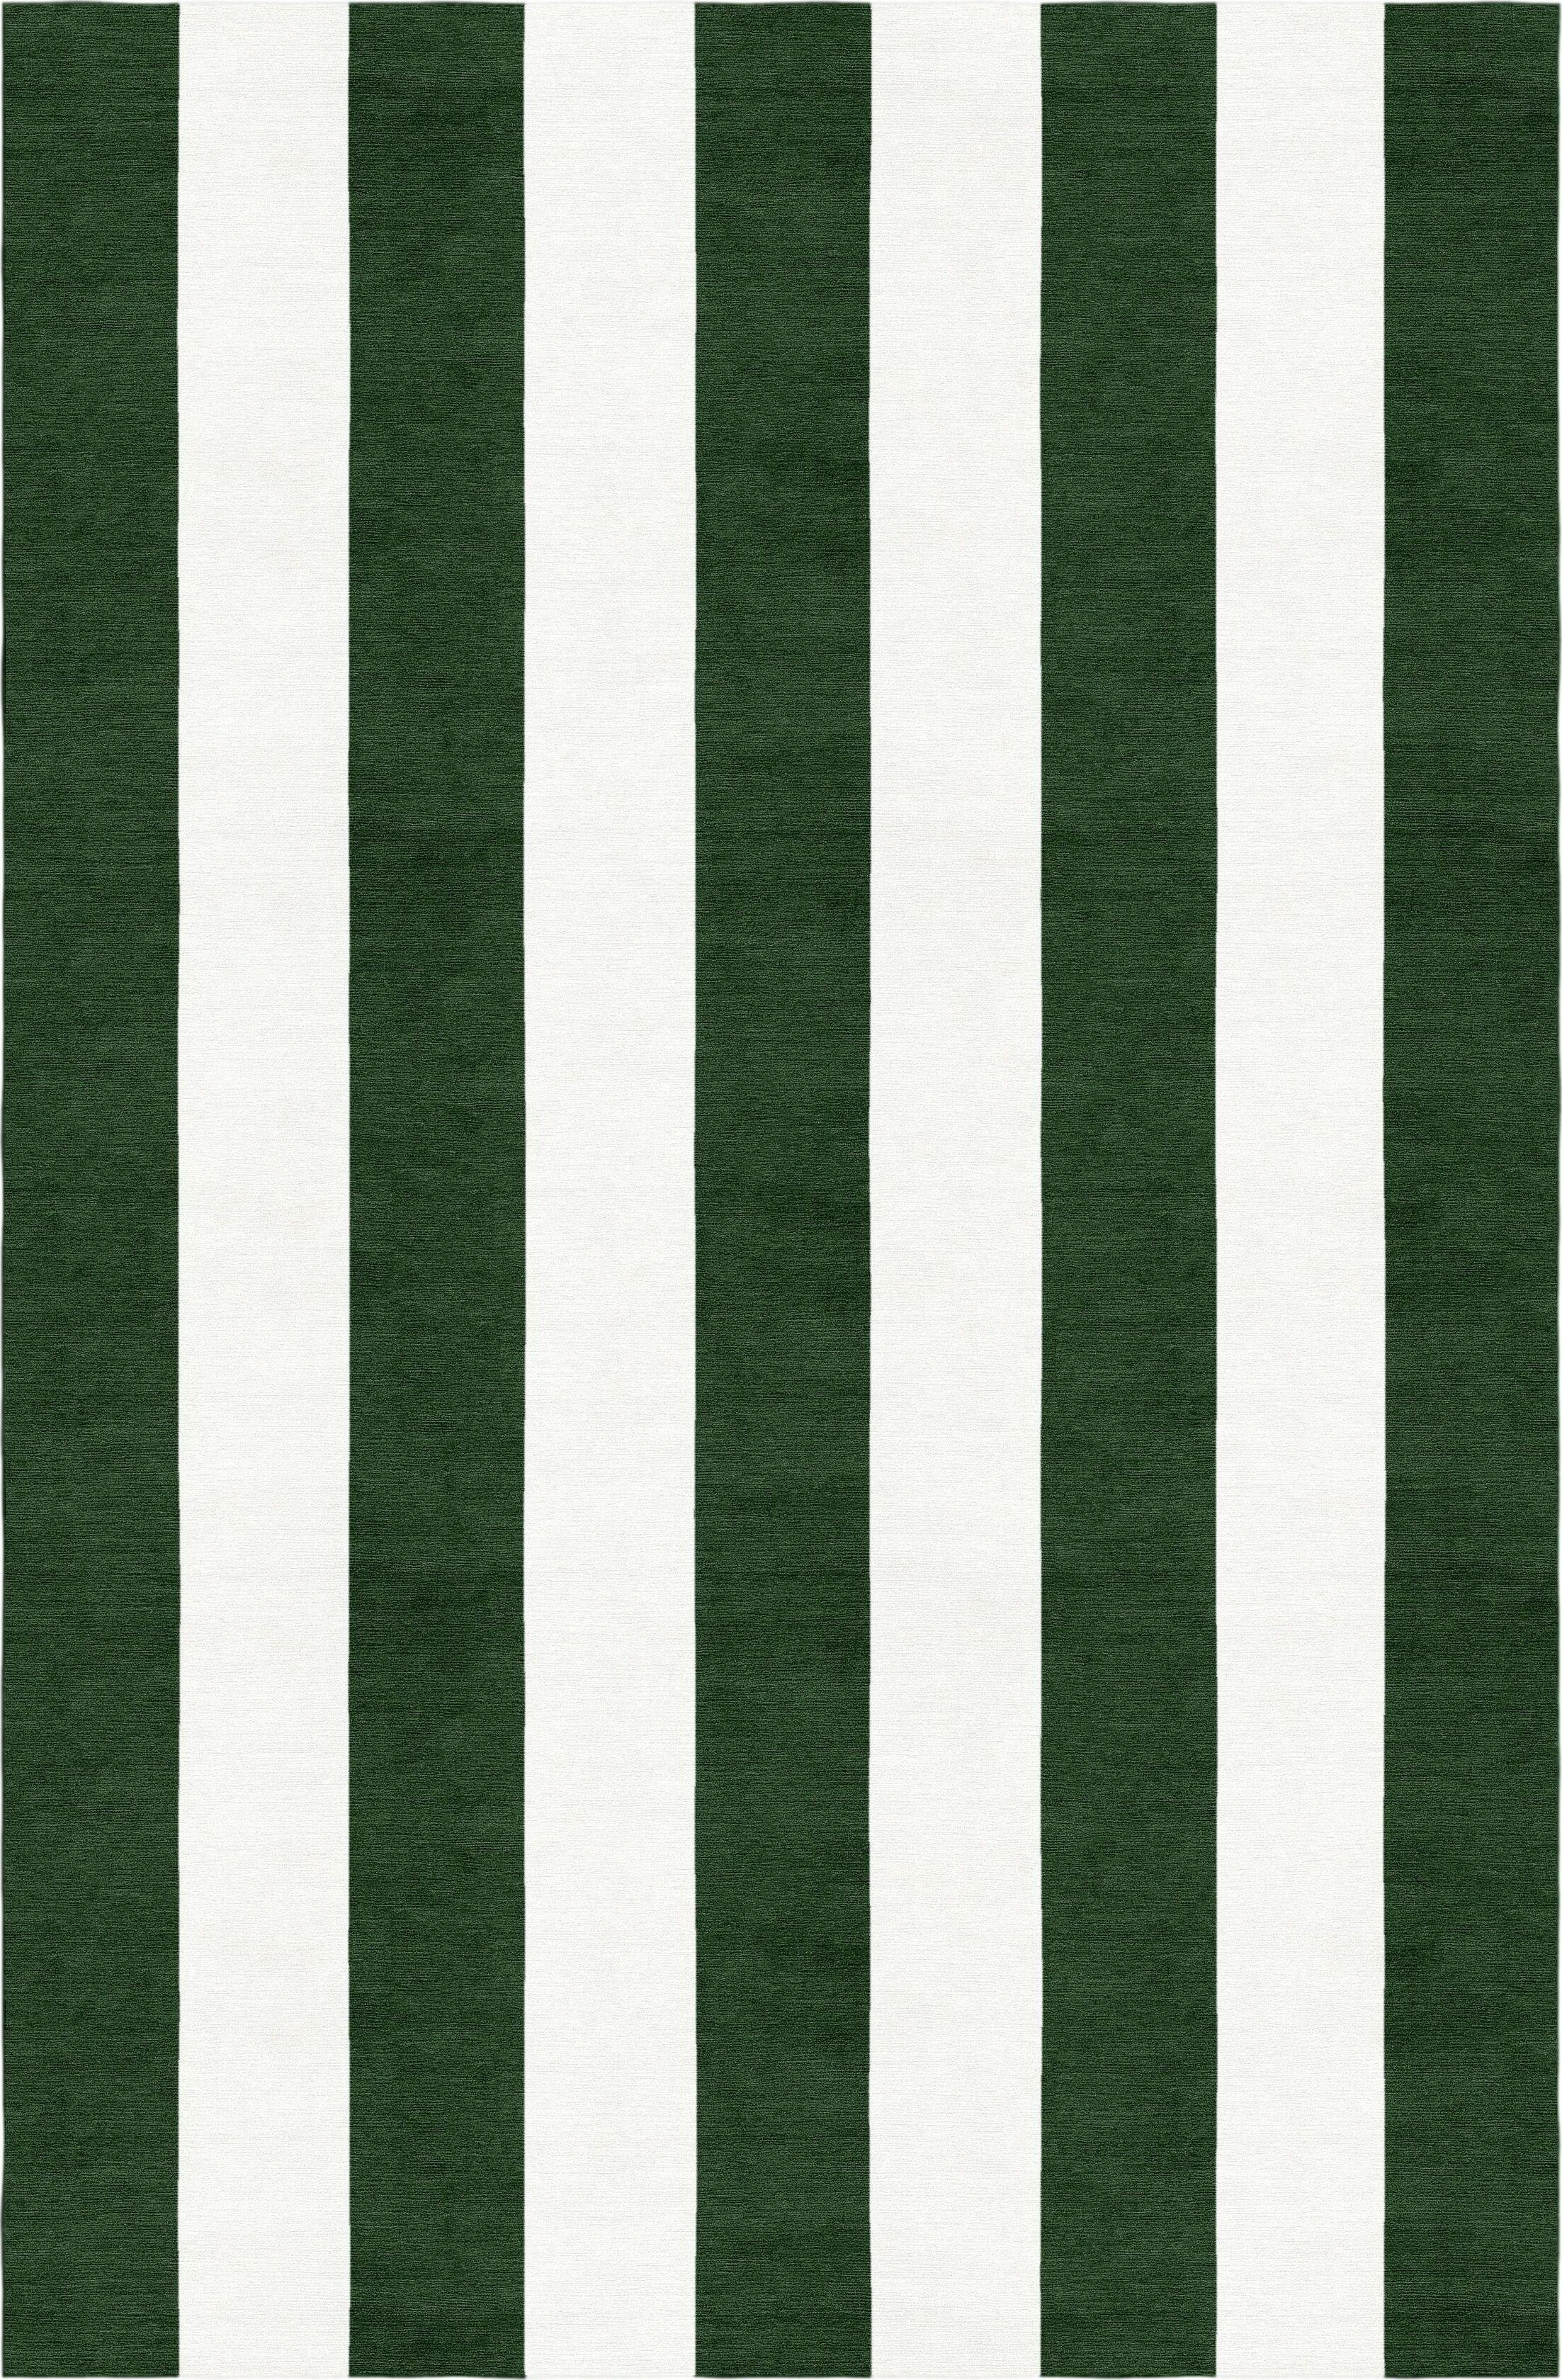 Watley Stripe Hand-Woven Wool Dark Green/White Area Rug Rug Size: Rectangle 8' x 10'